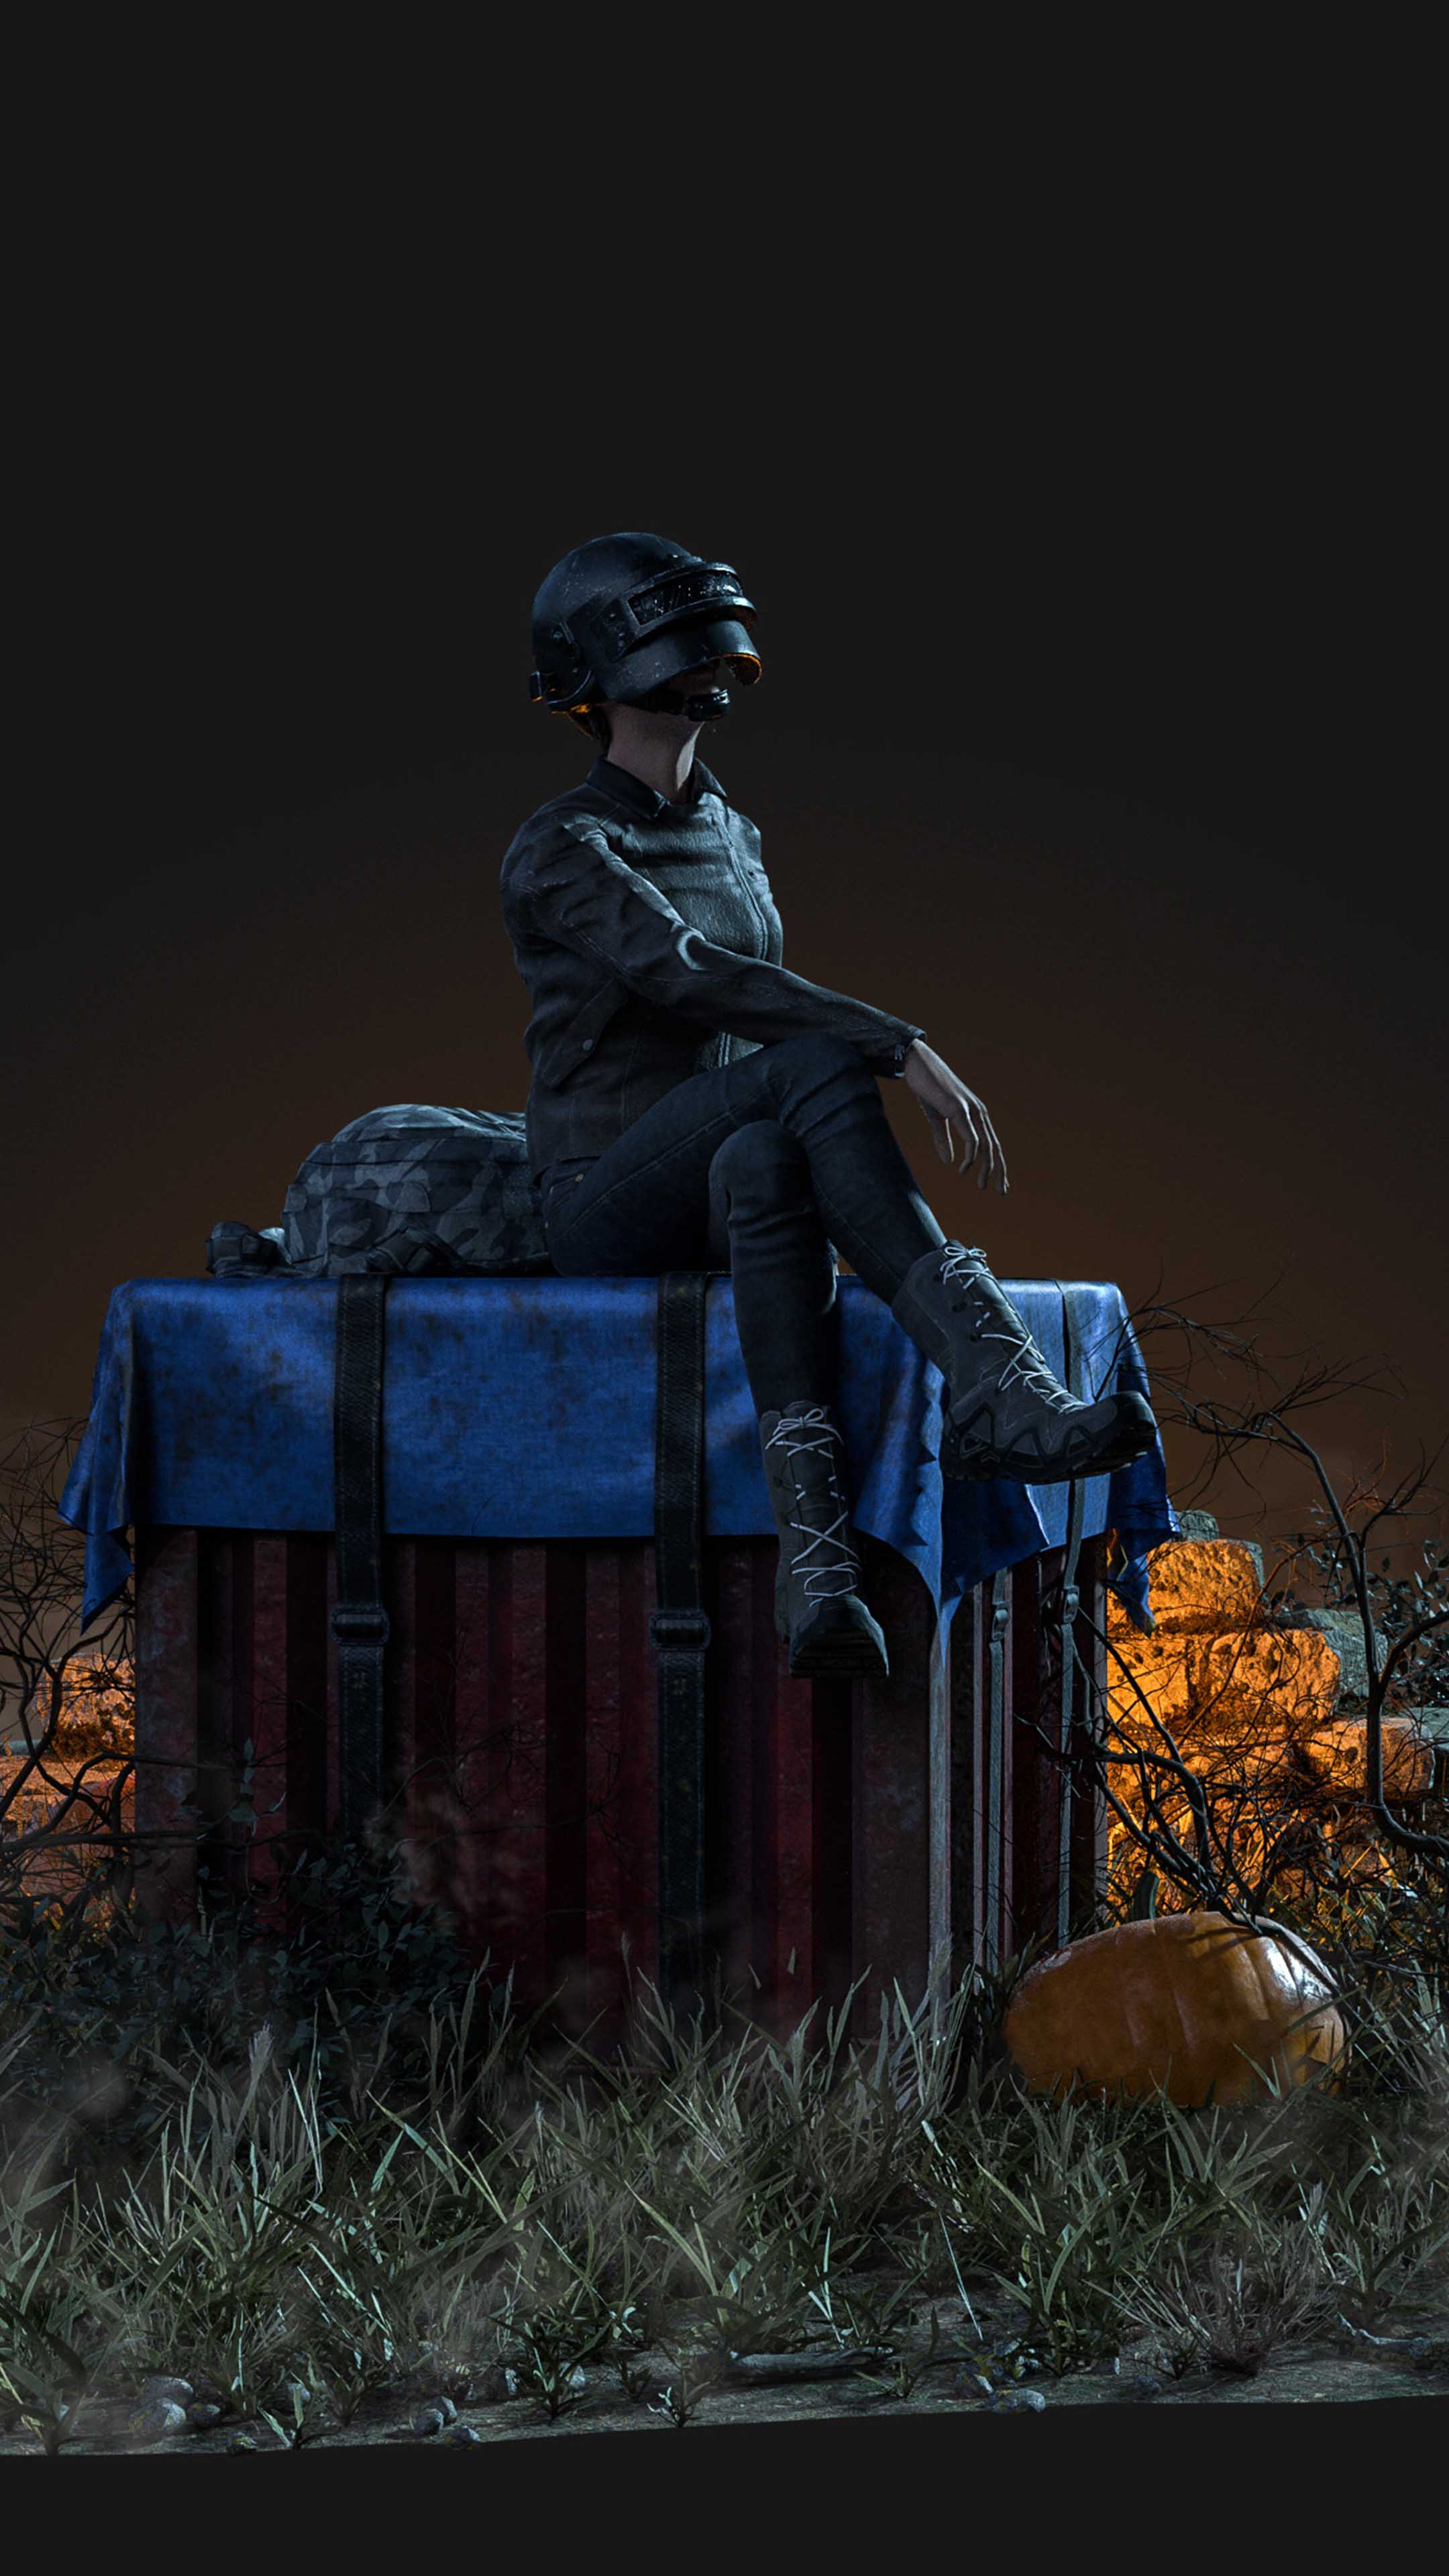 Pubg Girl Sitting On Air Drop Box 4k Ultra Hd Mobile Wallpaper